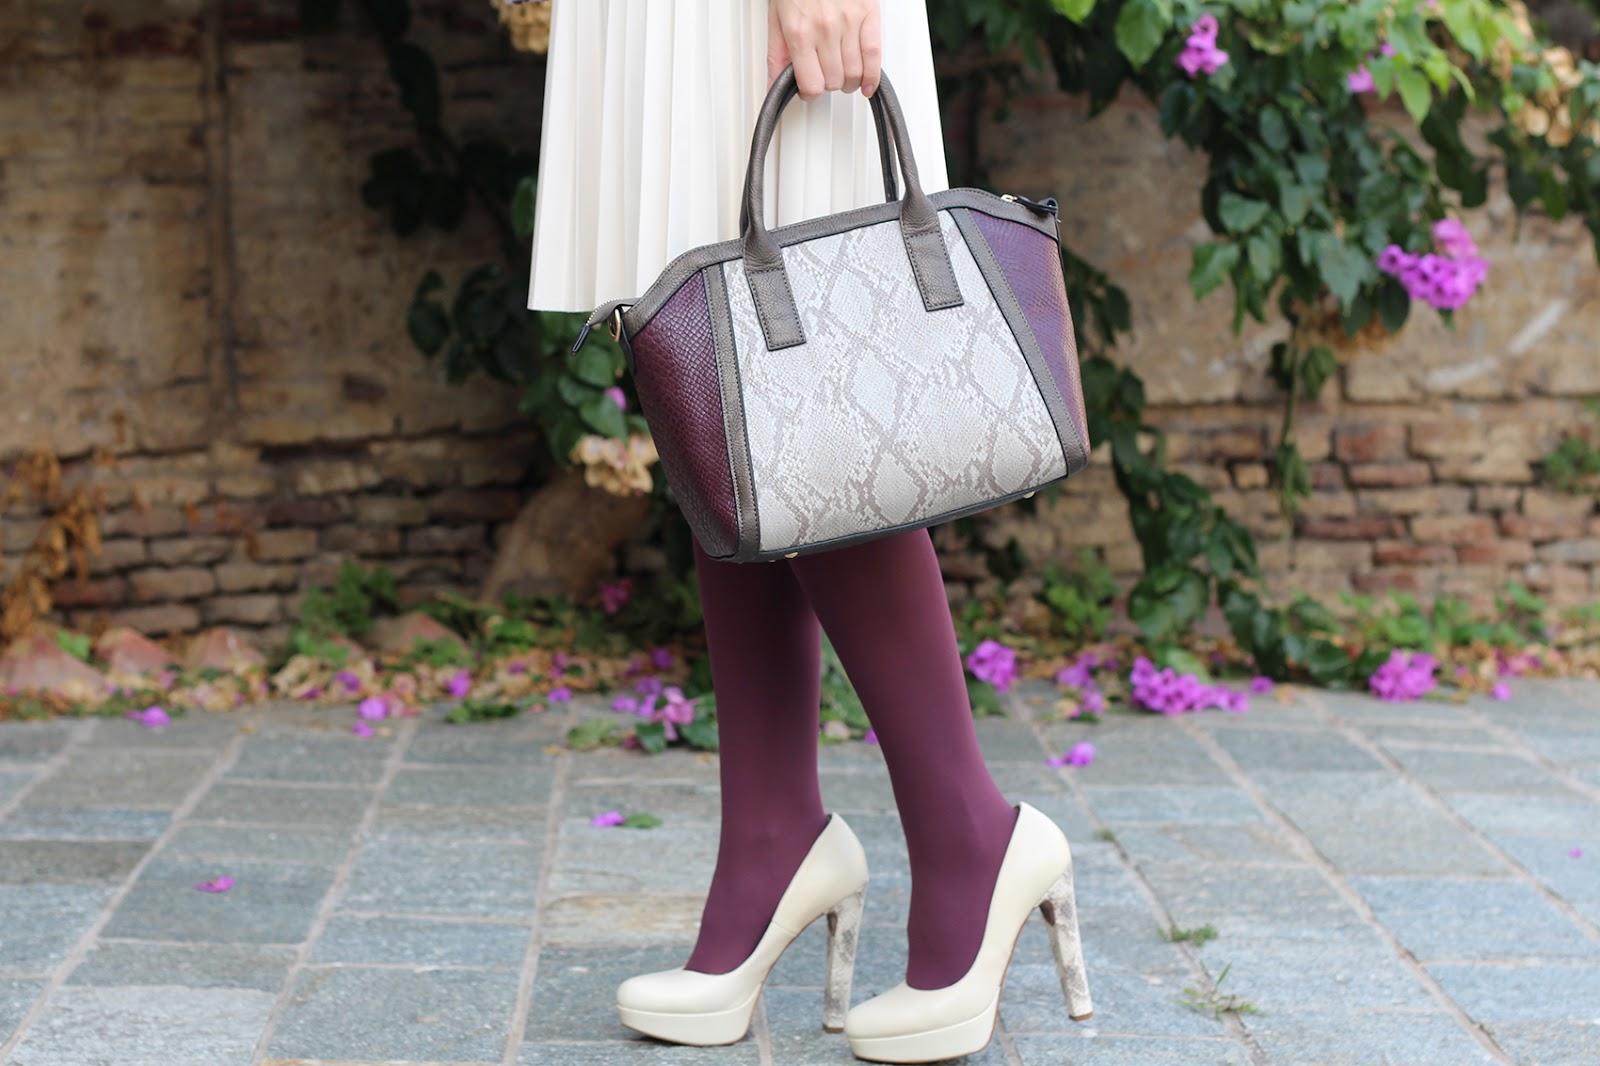 bijou brigitte bag animalier burgundy cream python pittarello heels scarpe shoes